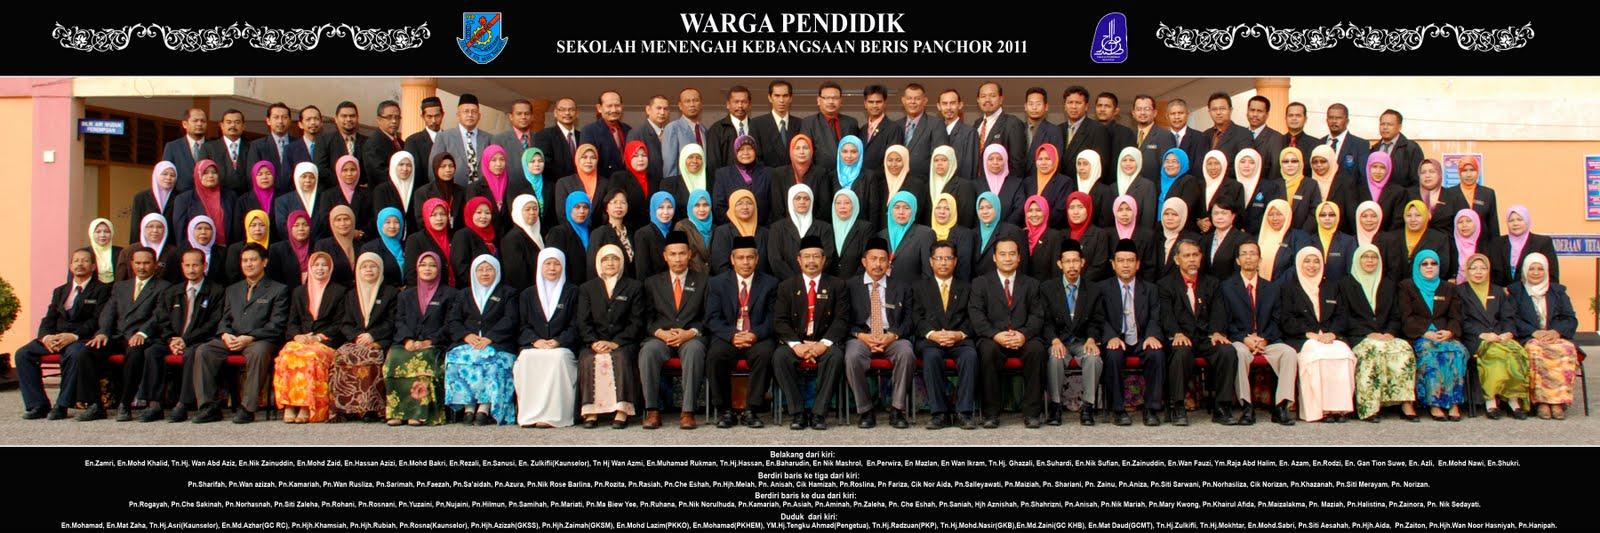 Sek Men Keb Beris Panchor 16320 Bachok Kelantan